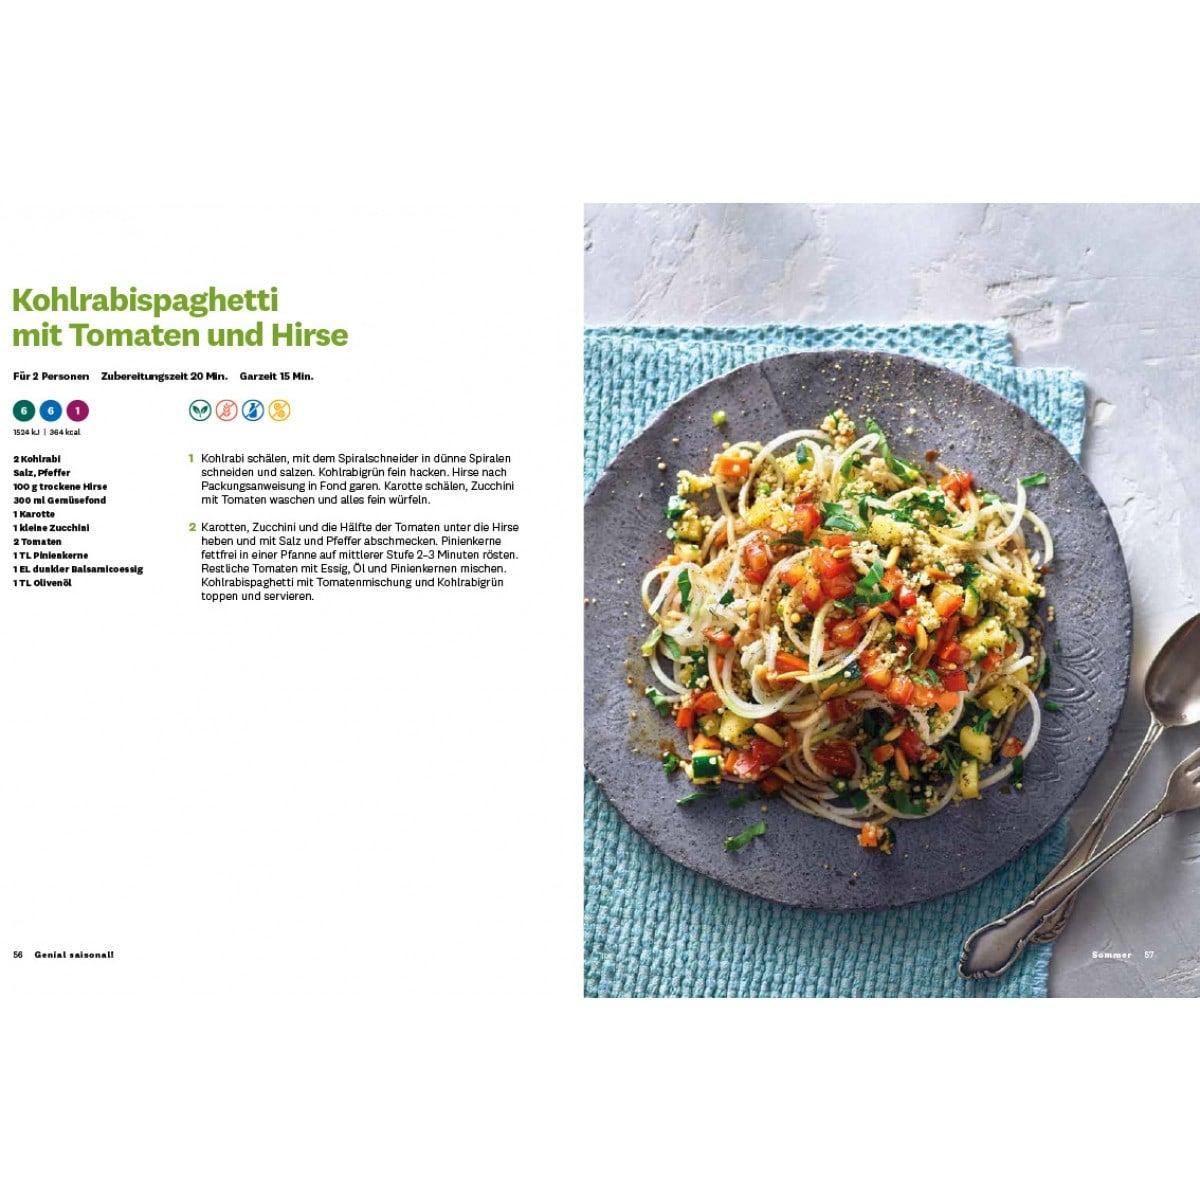 "WW Kochbuch ""Genial saisonal!"" - Andi Schweiger (60 Rezepte) 4"